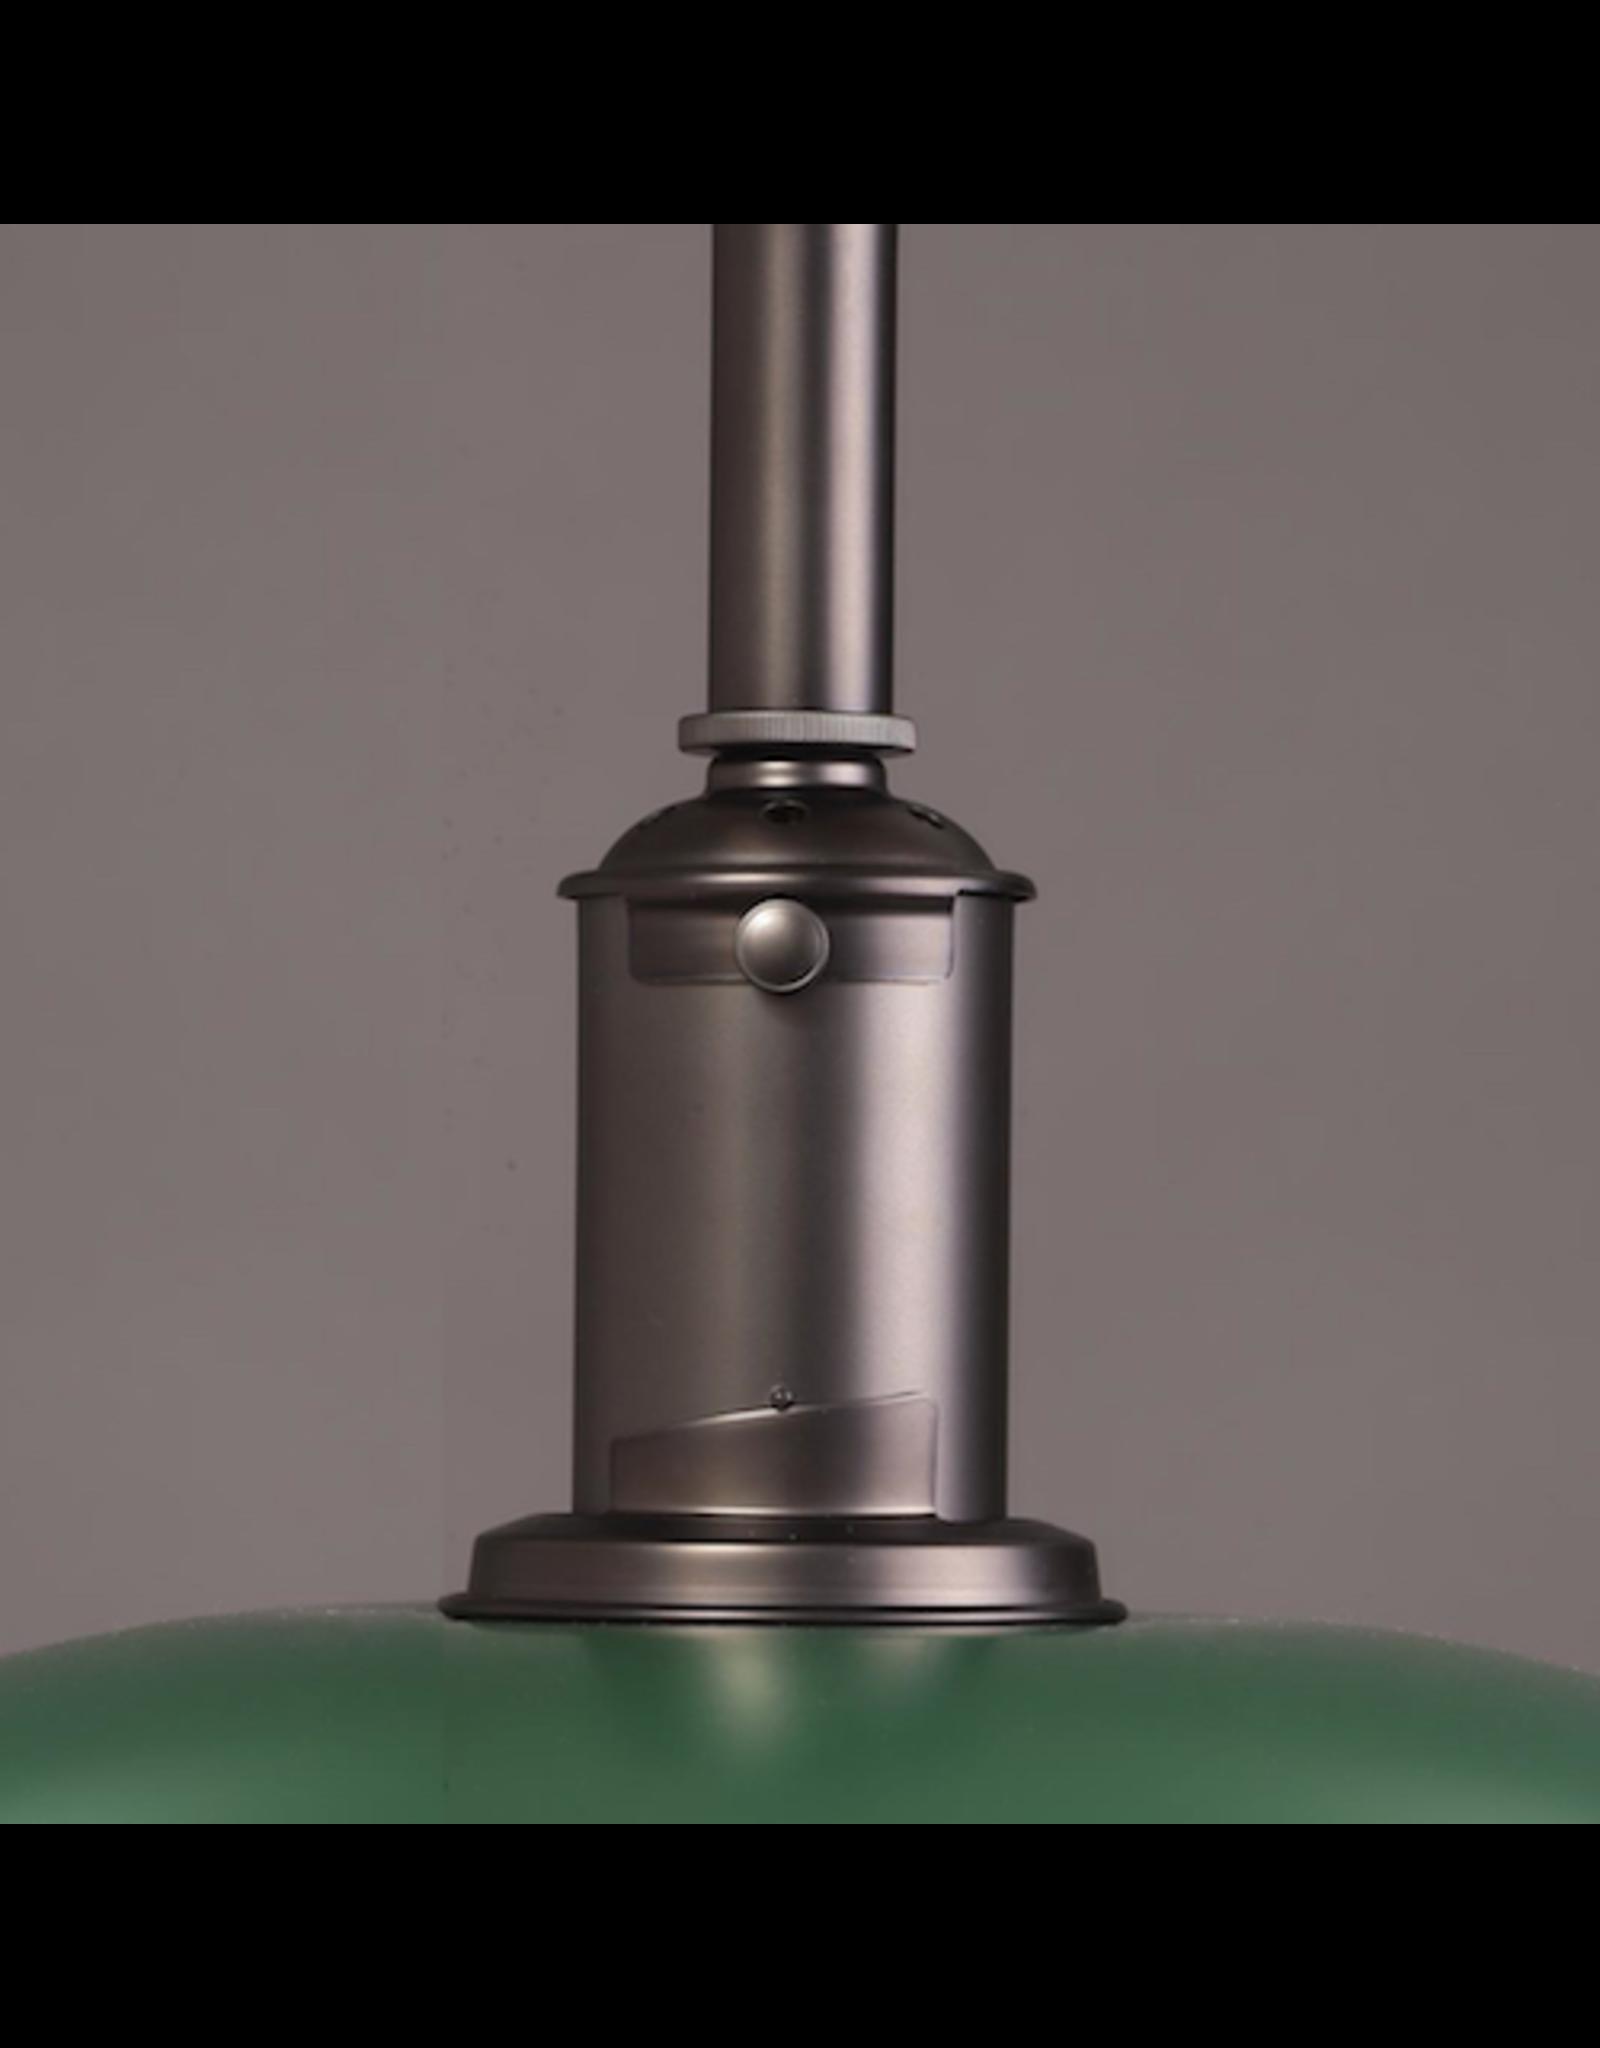 LOUIS POULSEN PH 3 1/2-3 PENDANT LAMP IN GREEN